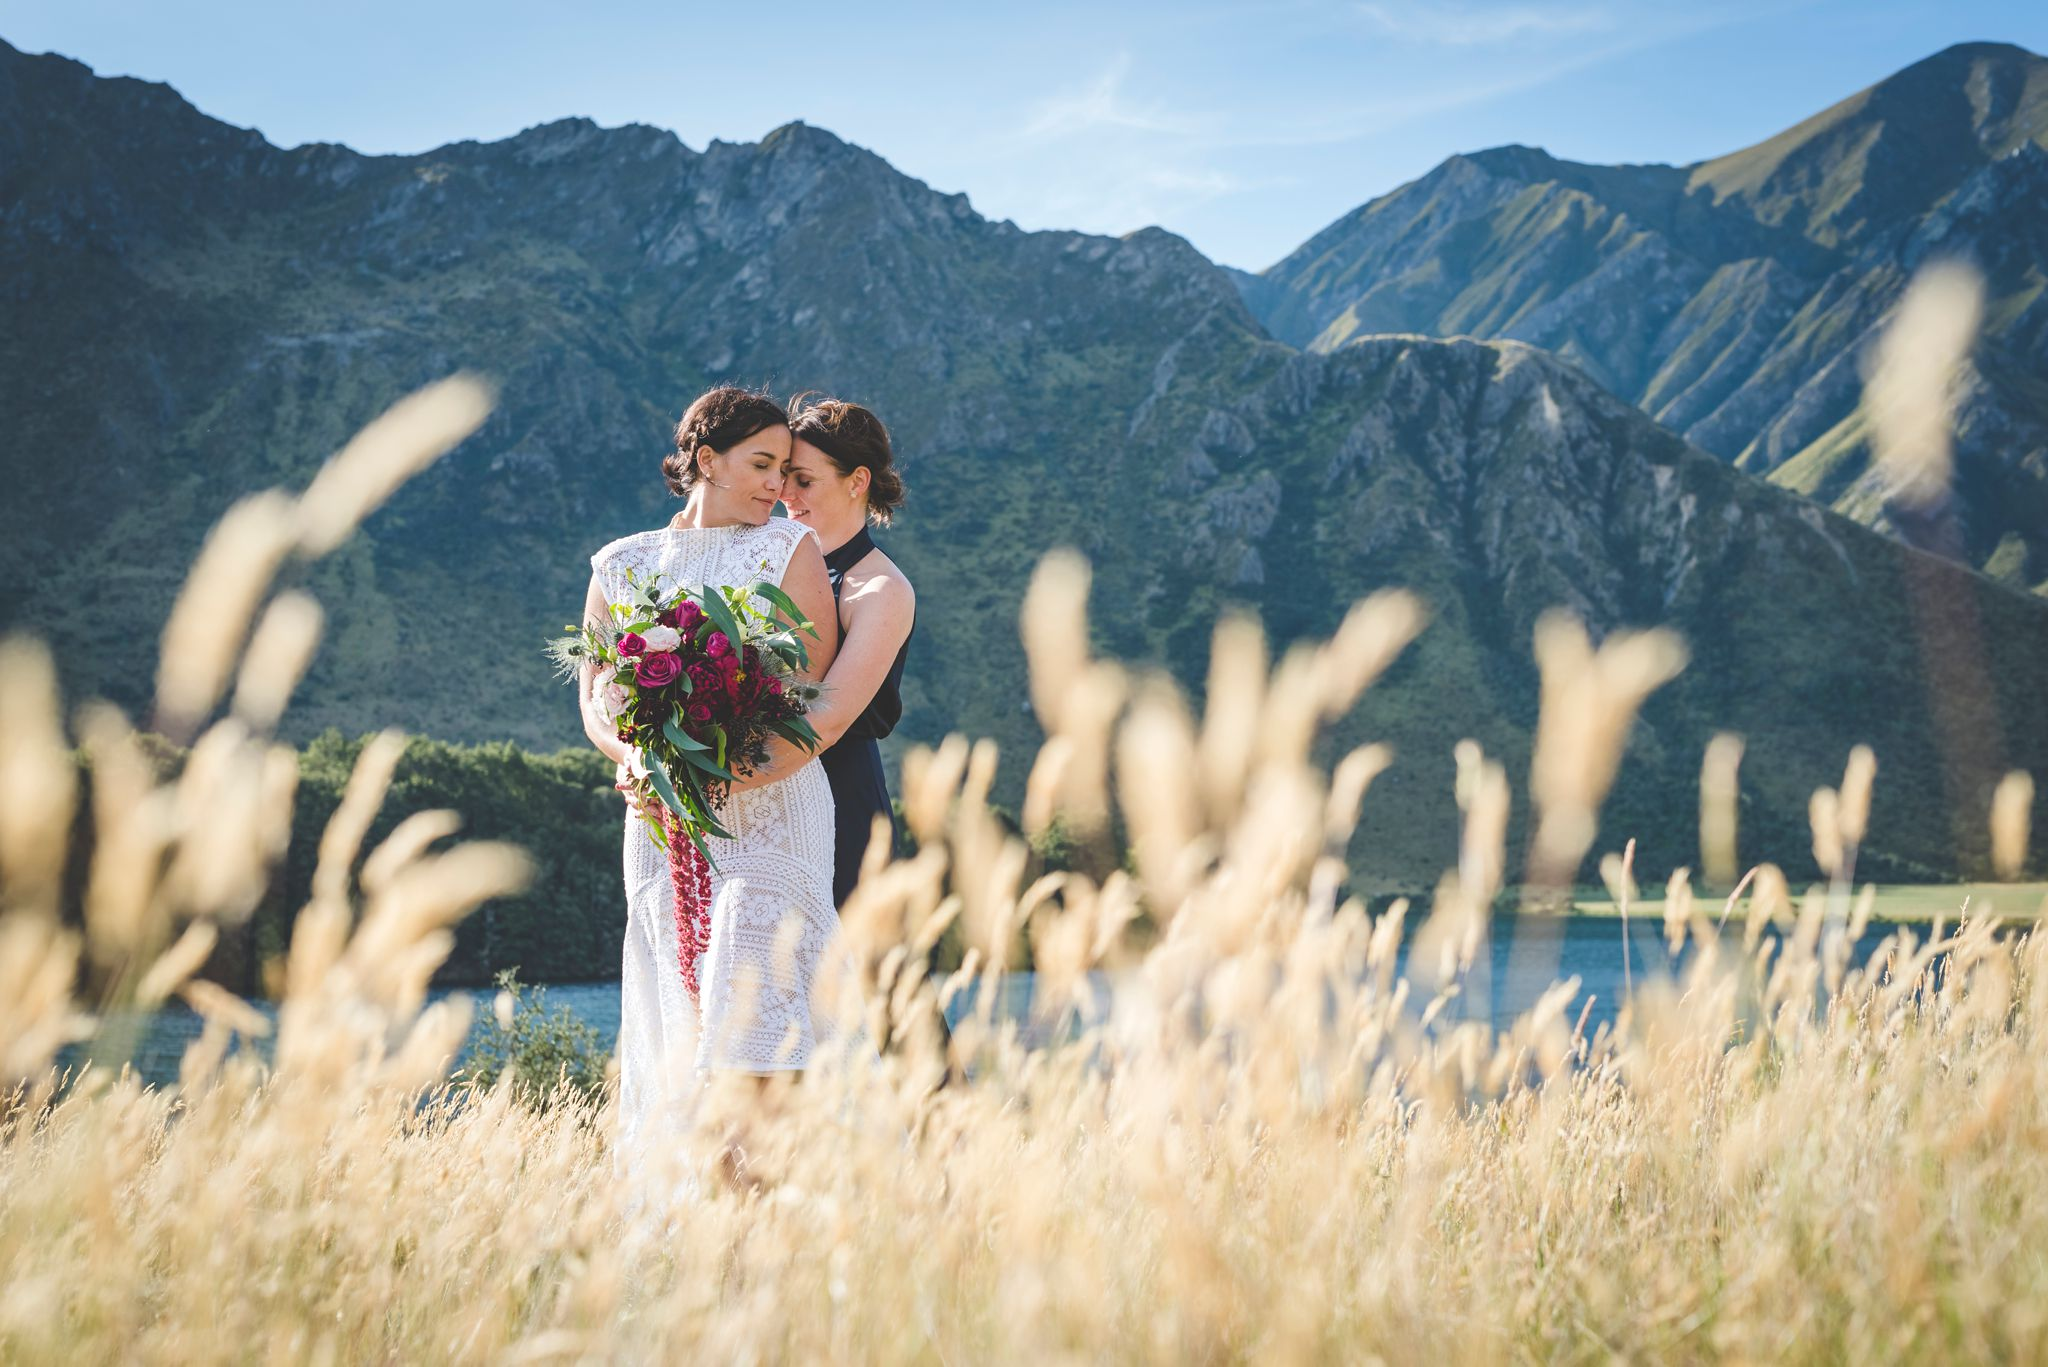 LIANN & MEGAN'S QUEENSTOWN WEDDING